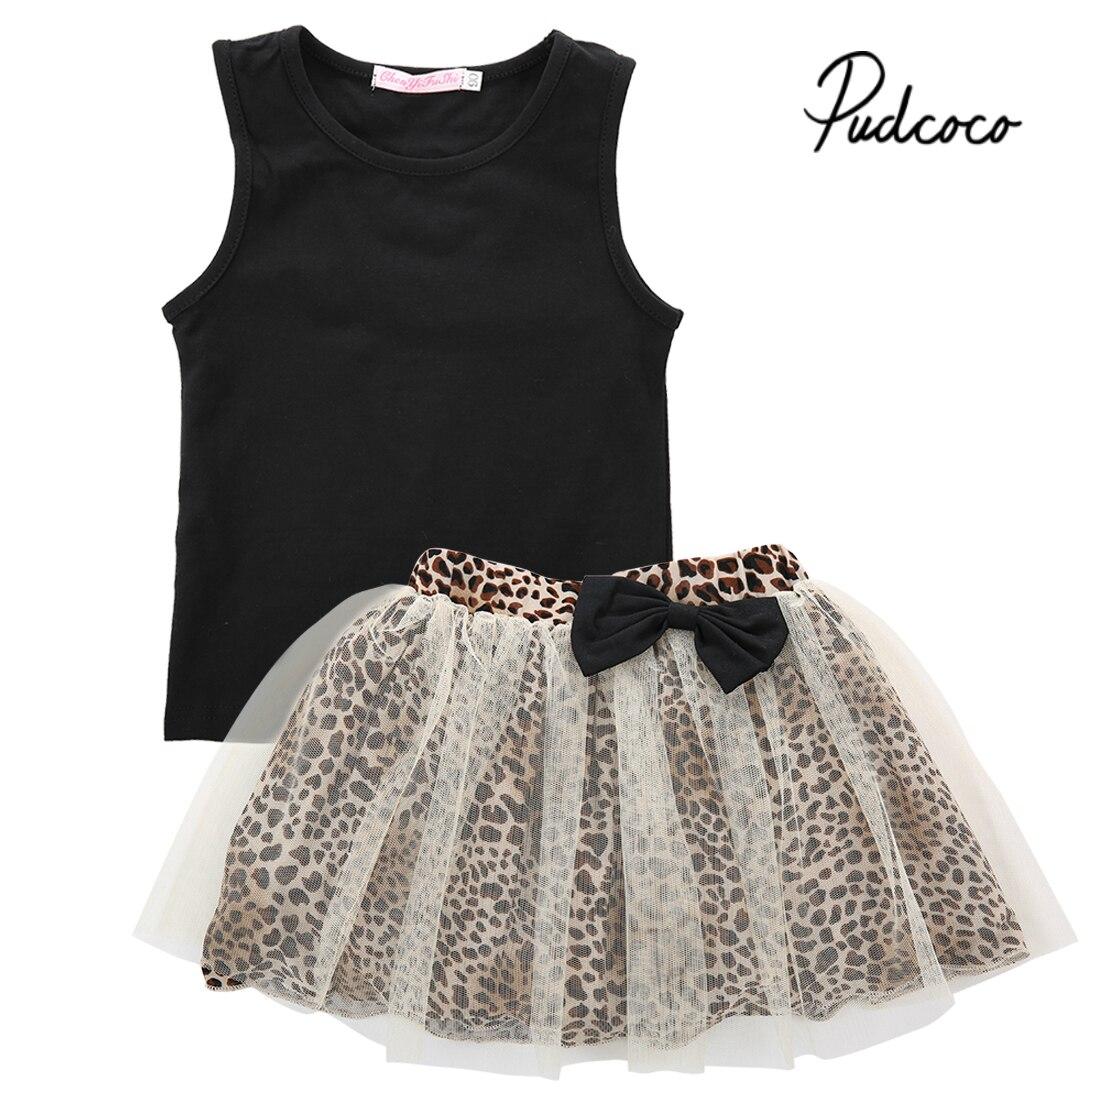 104983852 pudcoco 2019 Toddler Kids Baby Girl Black Tank Tops+Bow Mesh Leopard Skirts  Summer Sleeveless